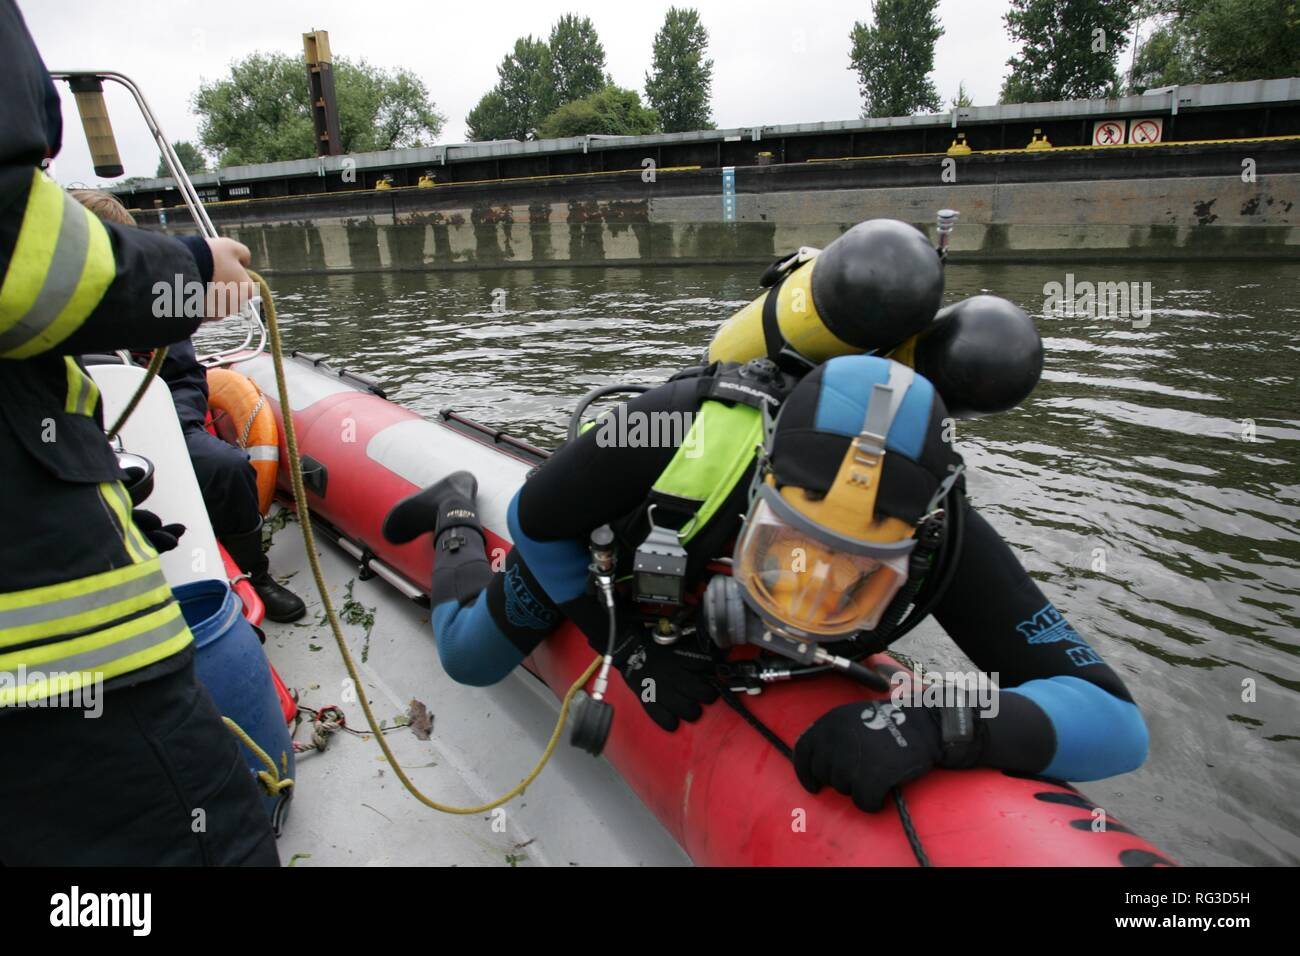 DEU, Federal Republic of Germany, Duisburg: Rescue diver of a fire brigade. - Stock Image